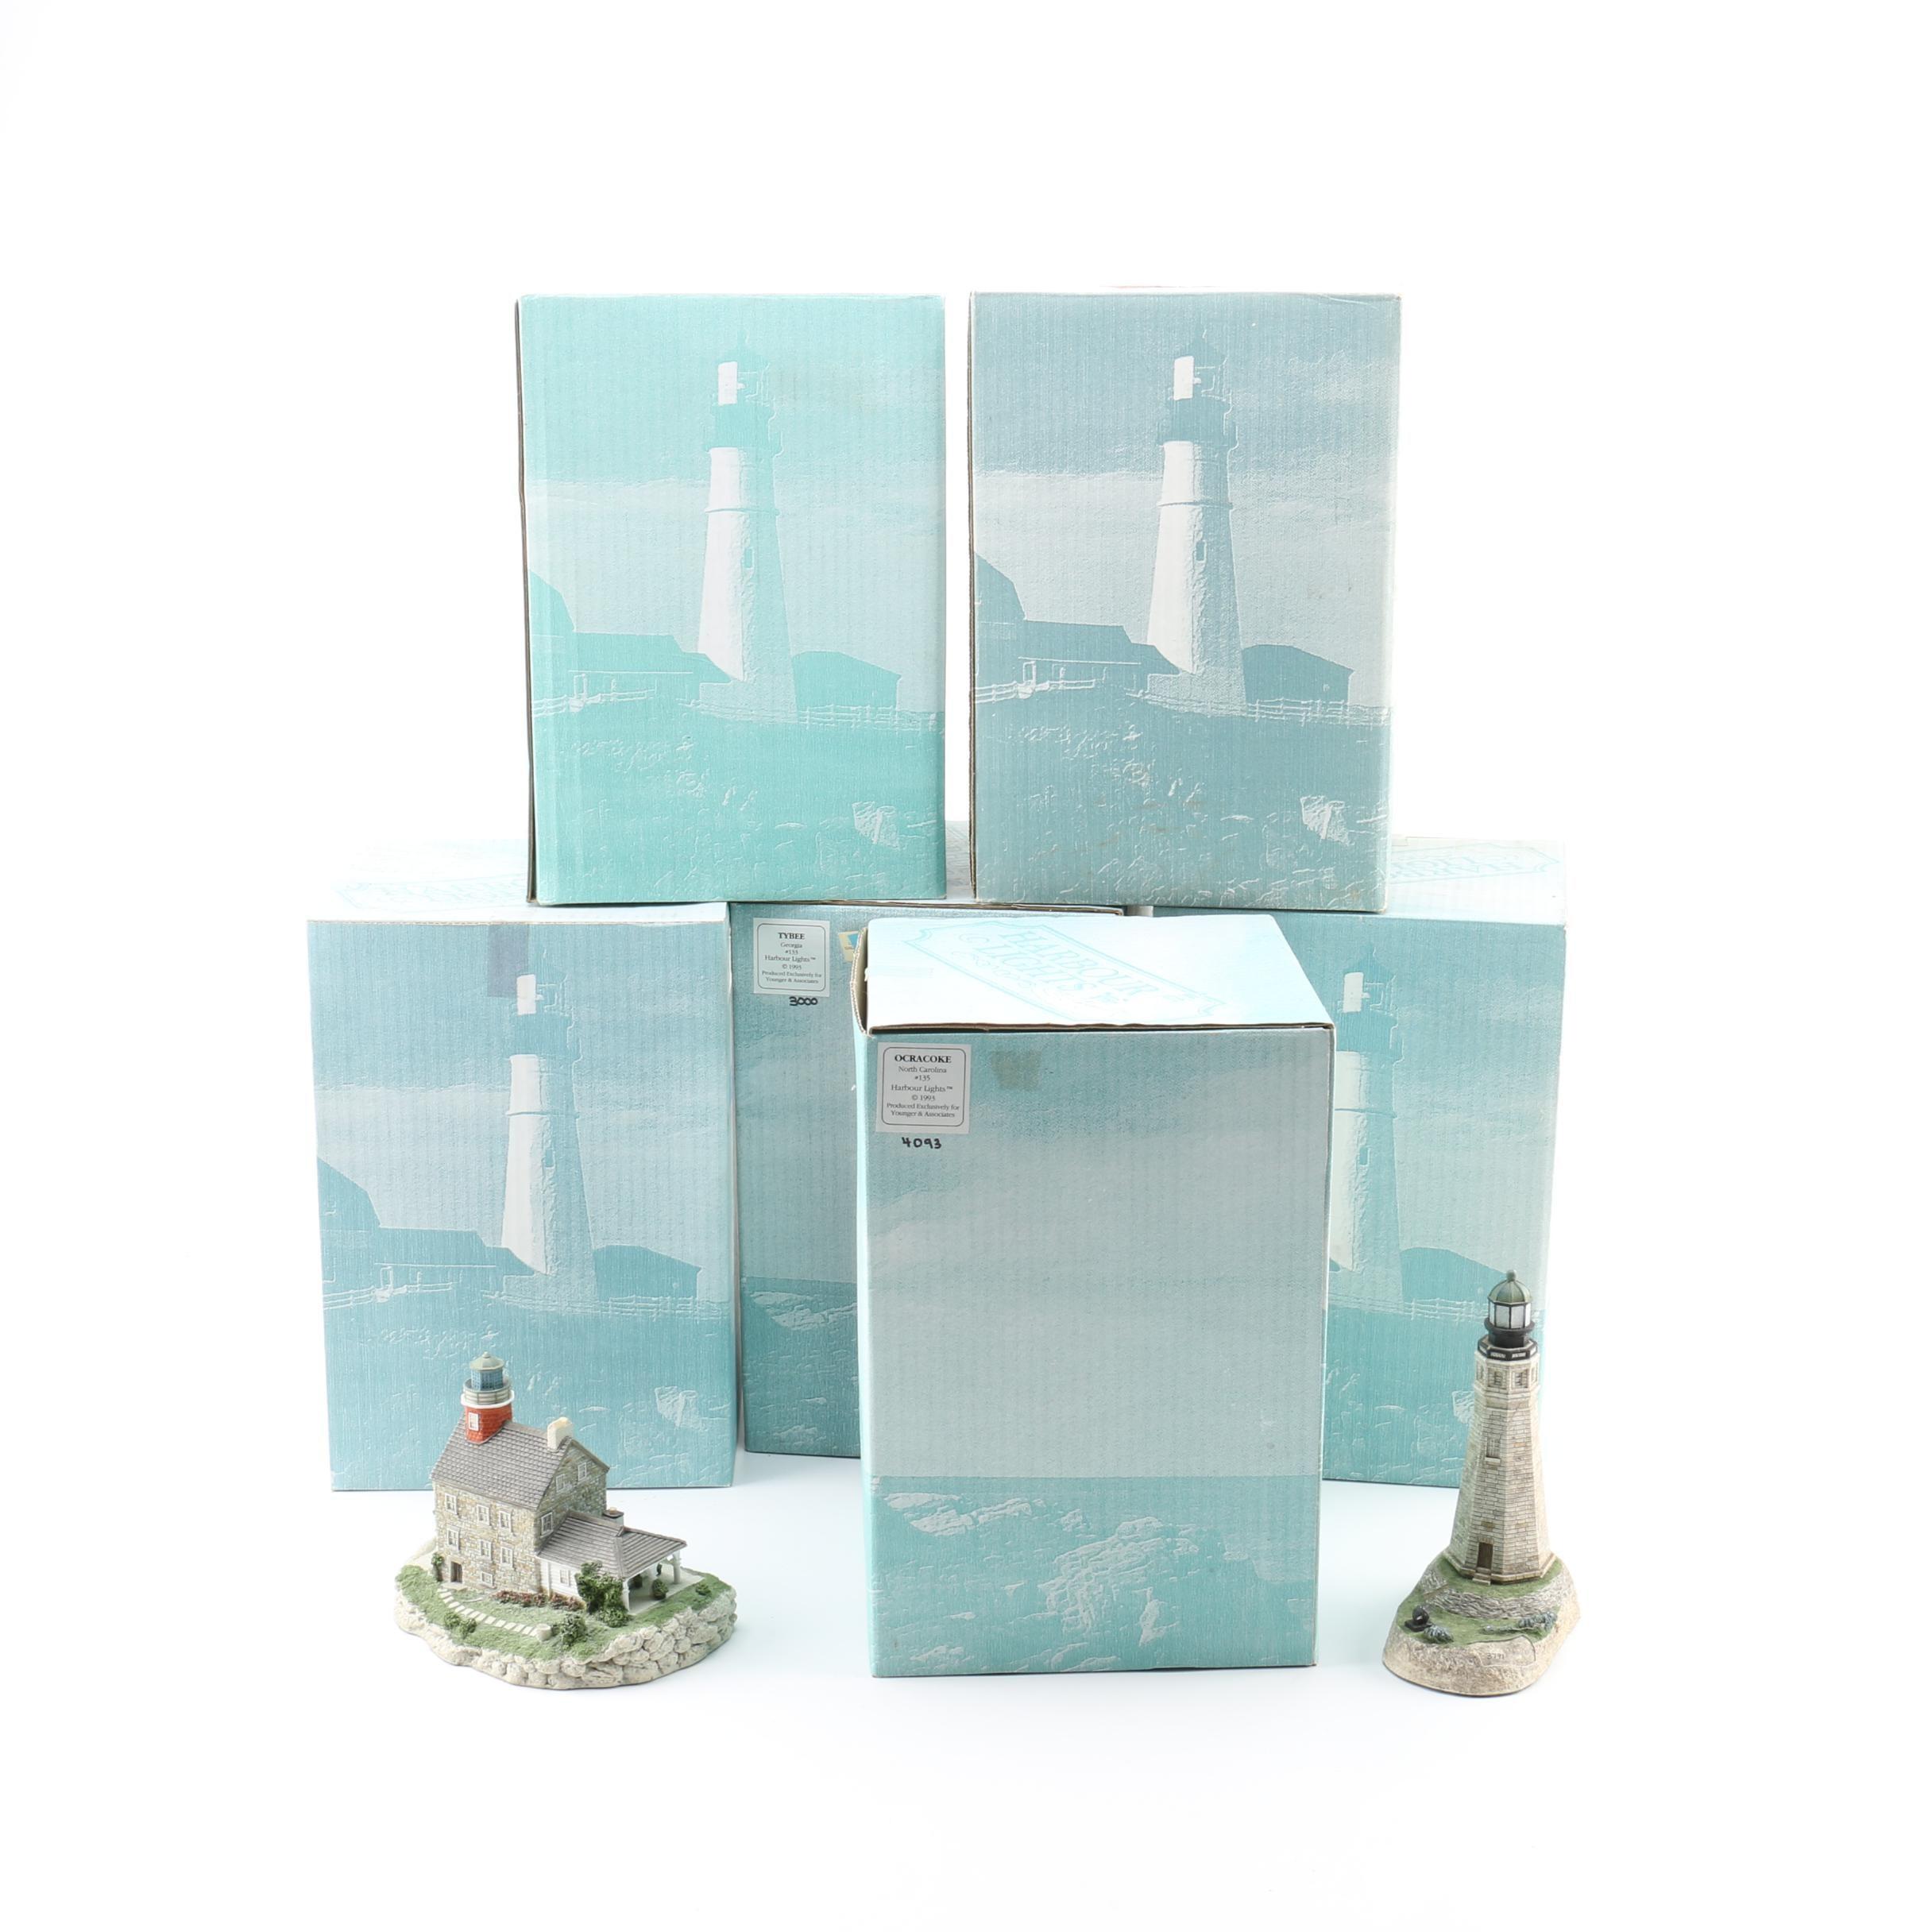 Harbour Lights Lighthouse Figurines